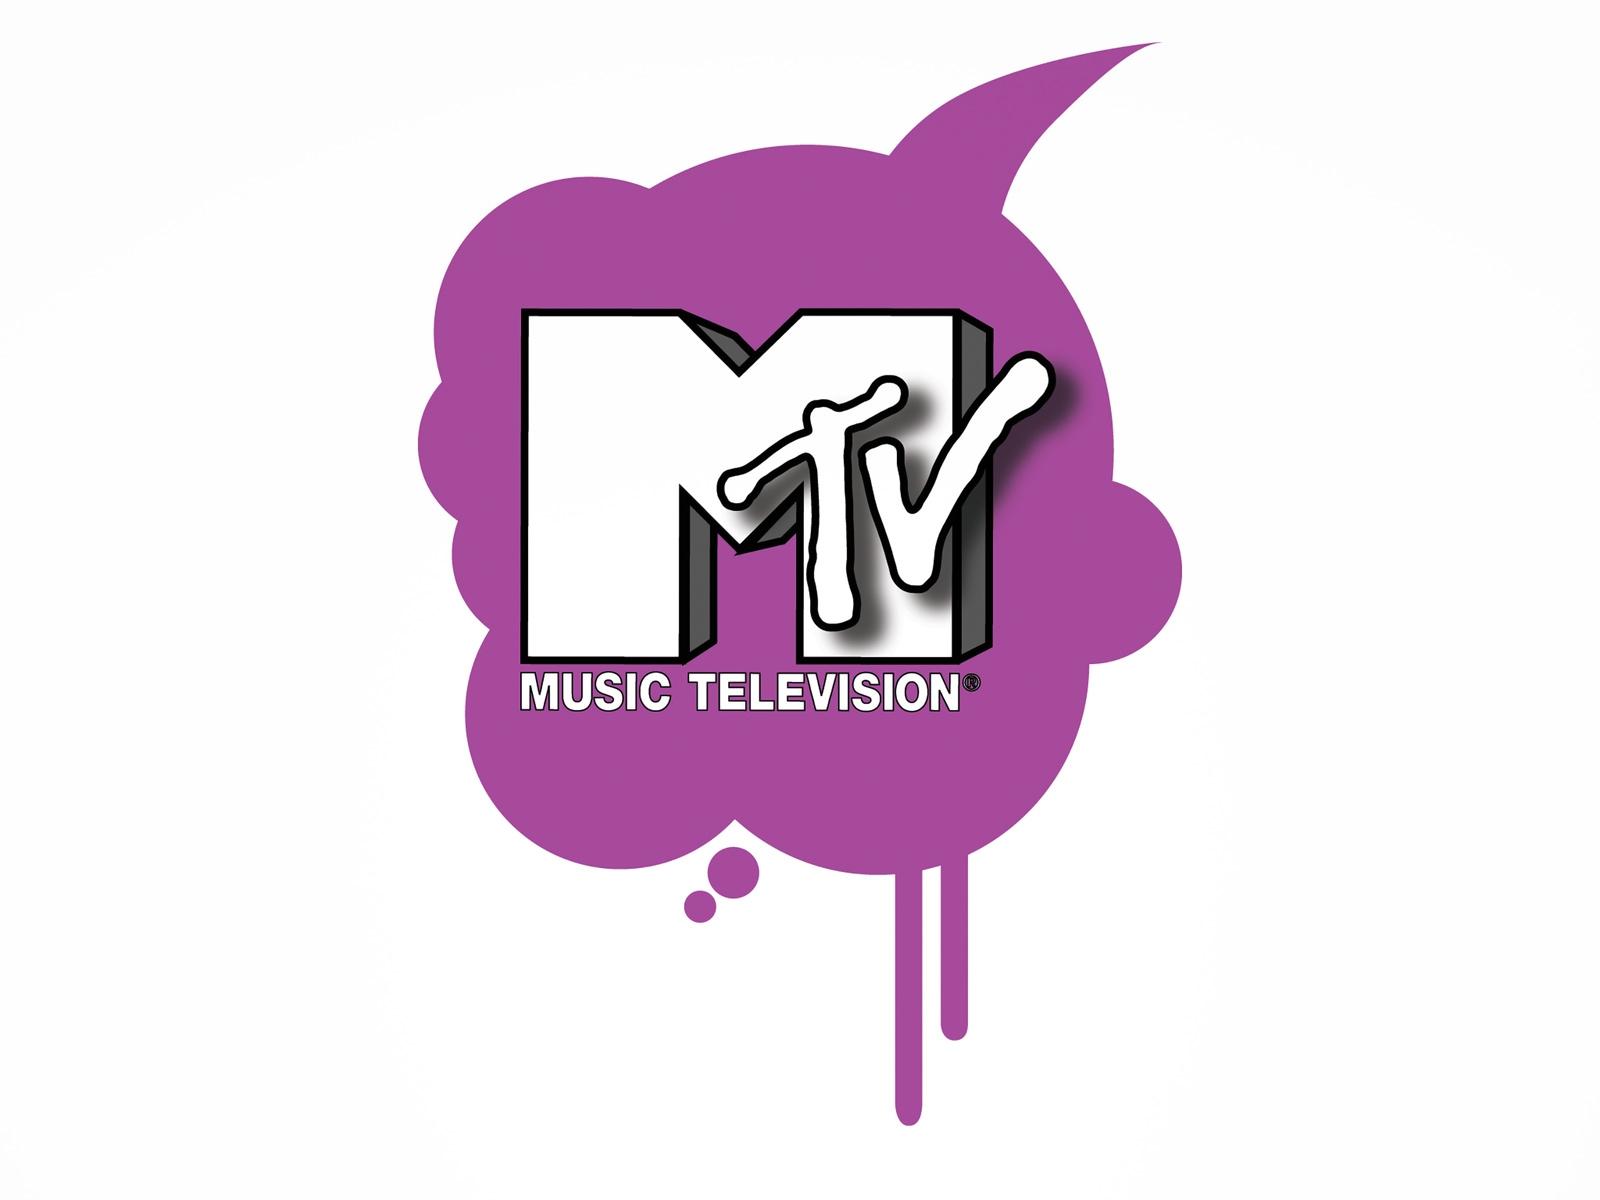 Cool Wallpaper Music Violet - mtv_logo_tv_music_television-786450  Trends_15814.jpg!d